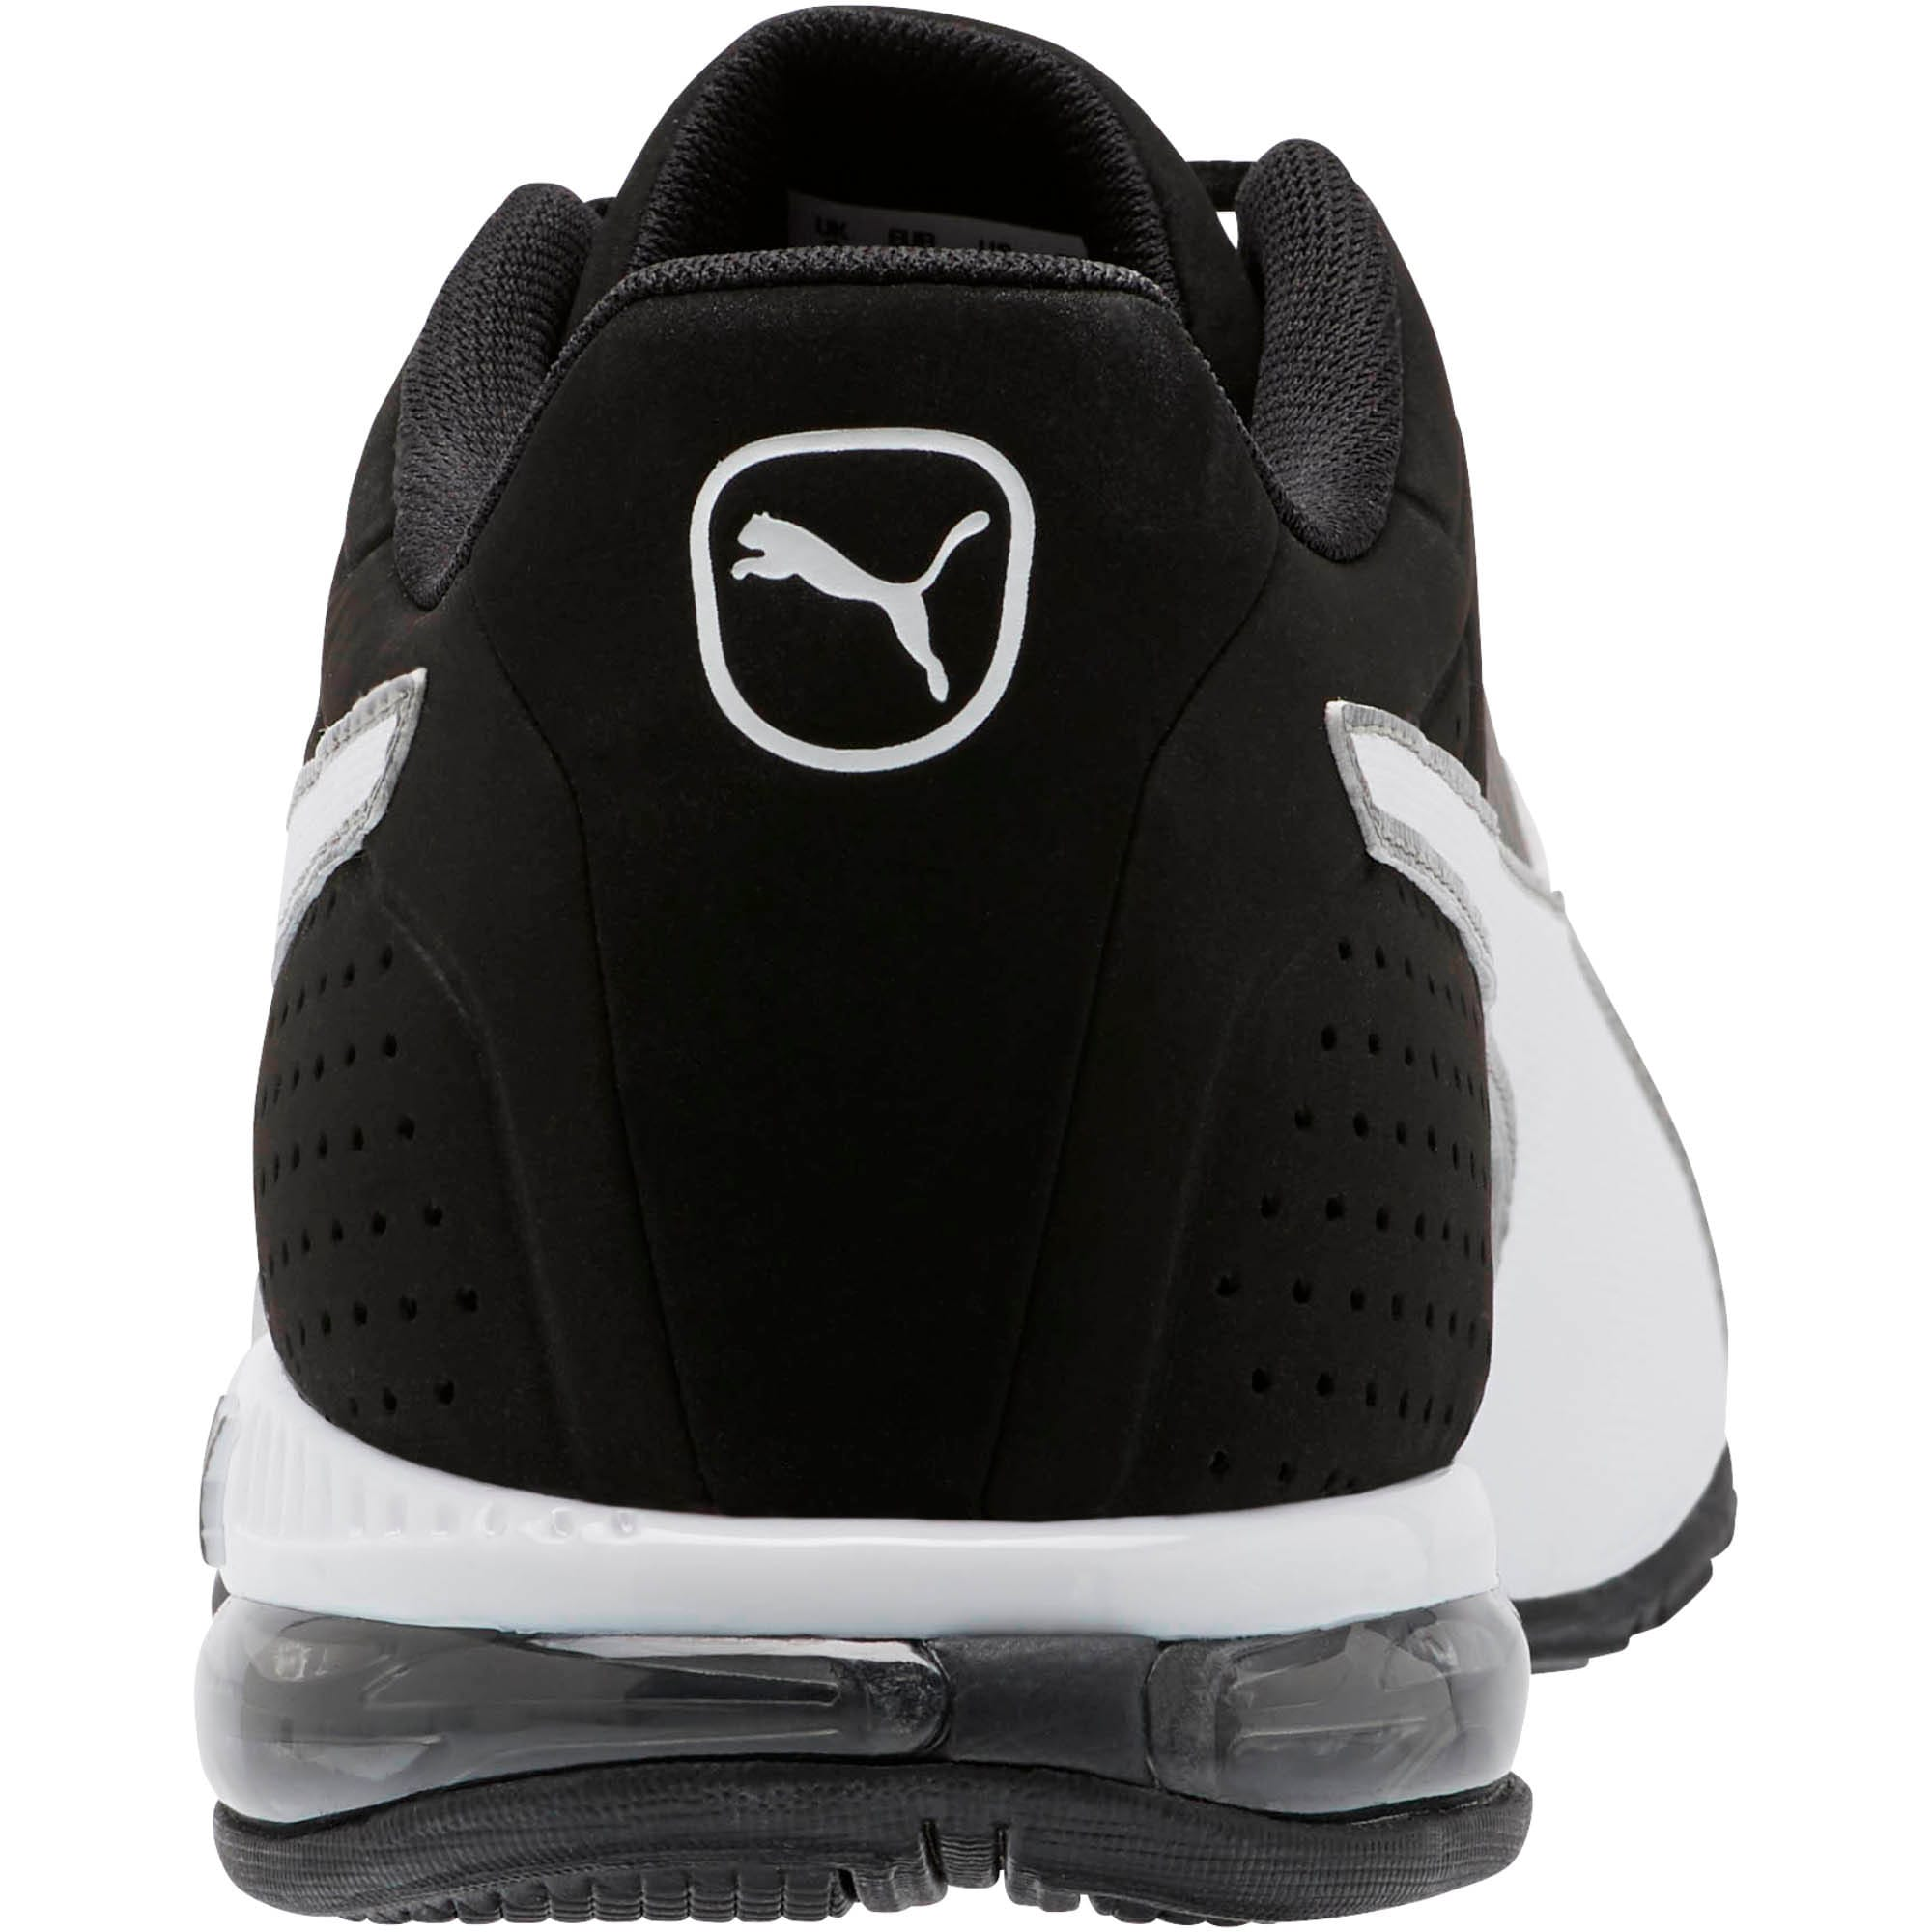 Thumbnail 3 of CELL Surin 2 Matte Men's Training Shoes, Charcoal Gray-Puma White, medium